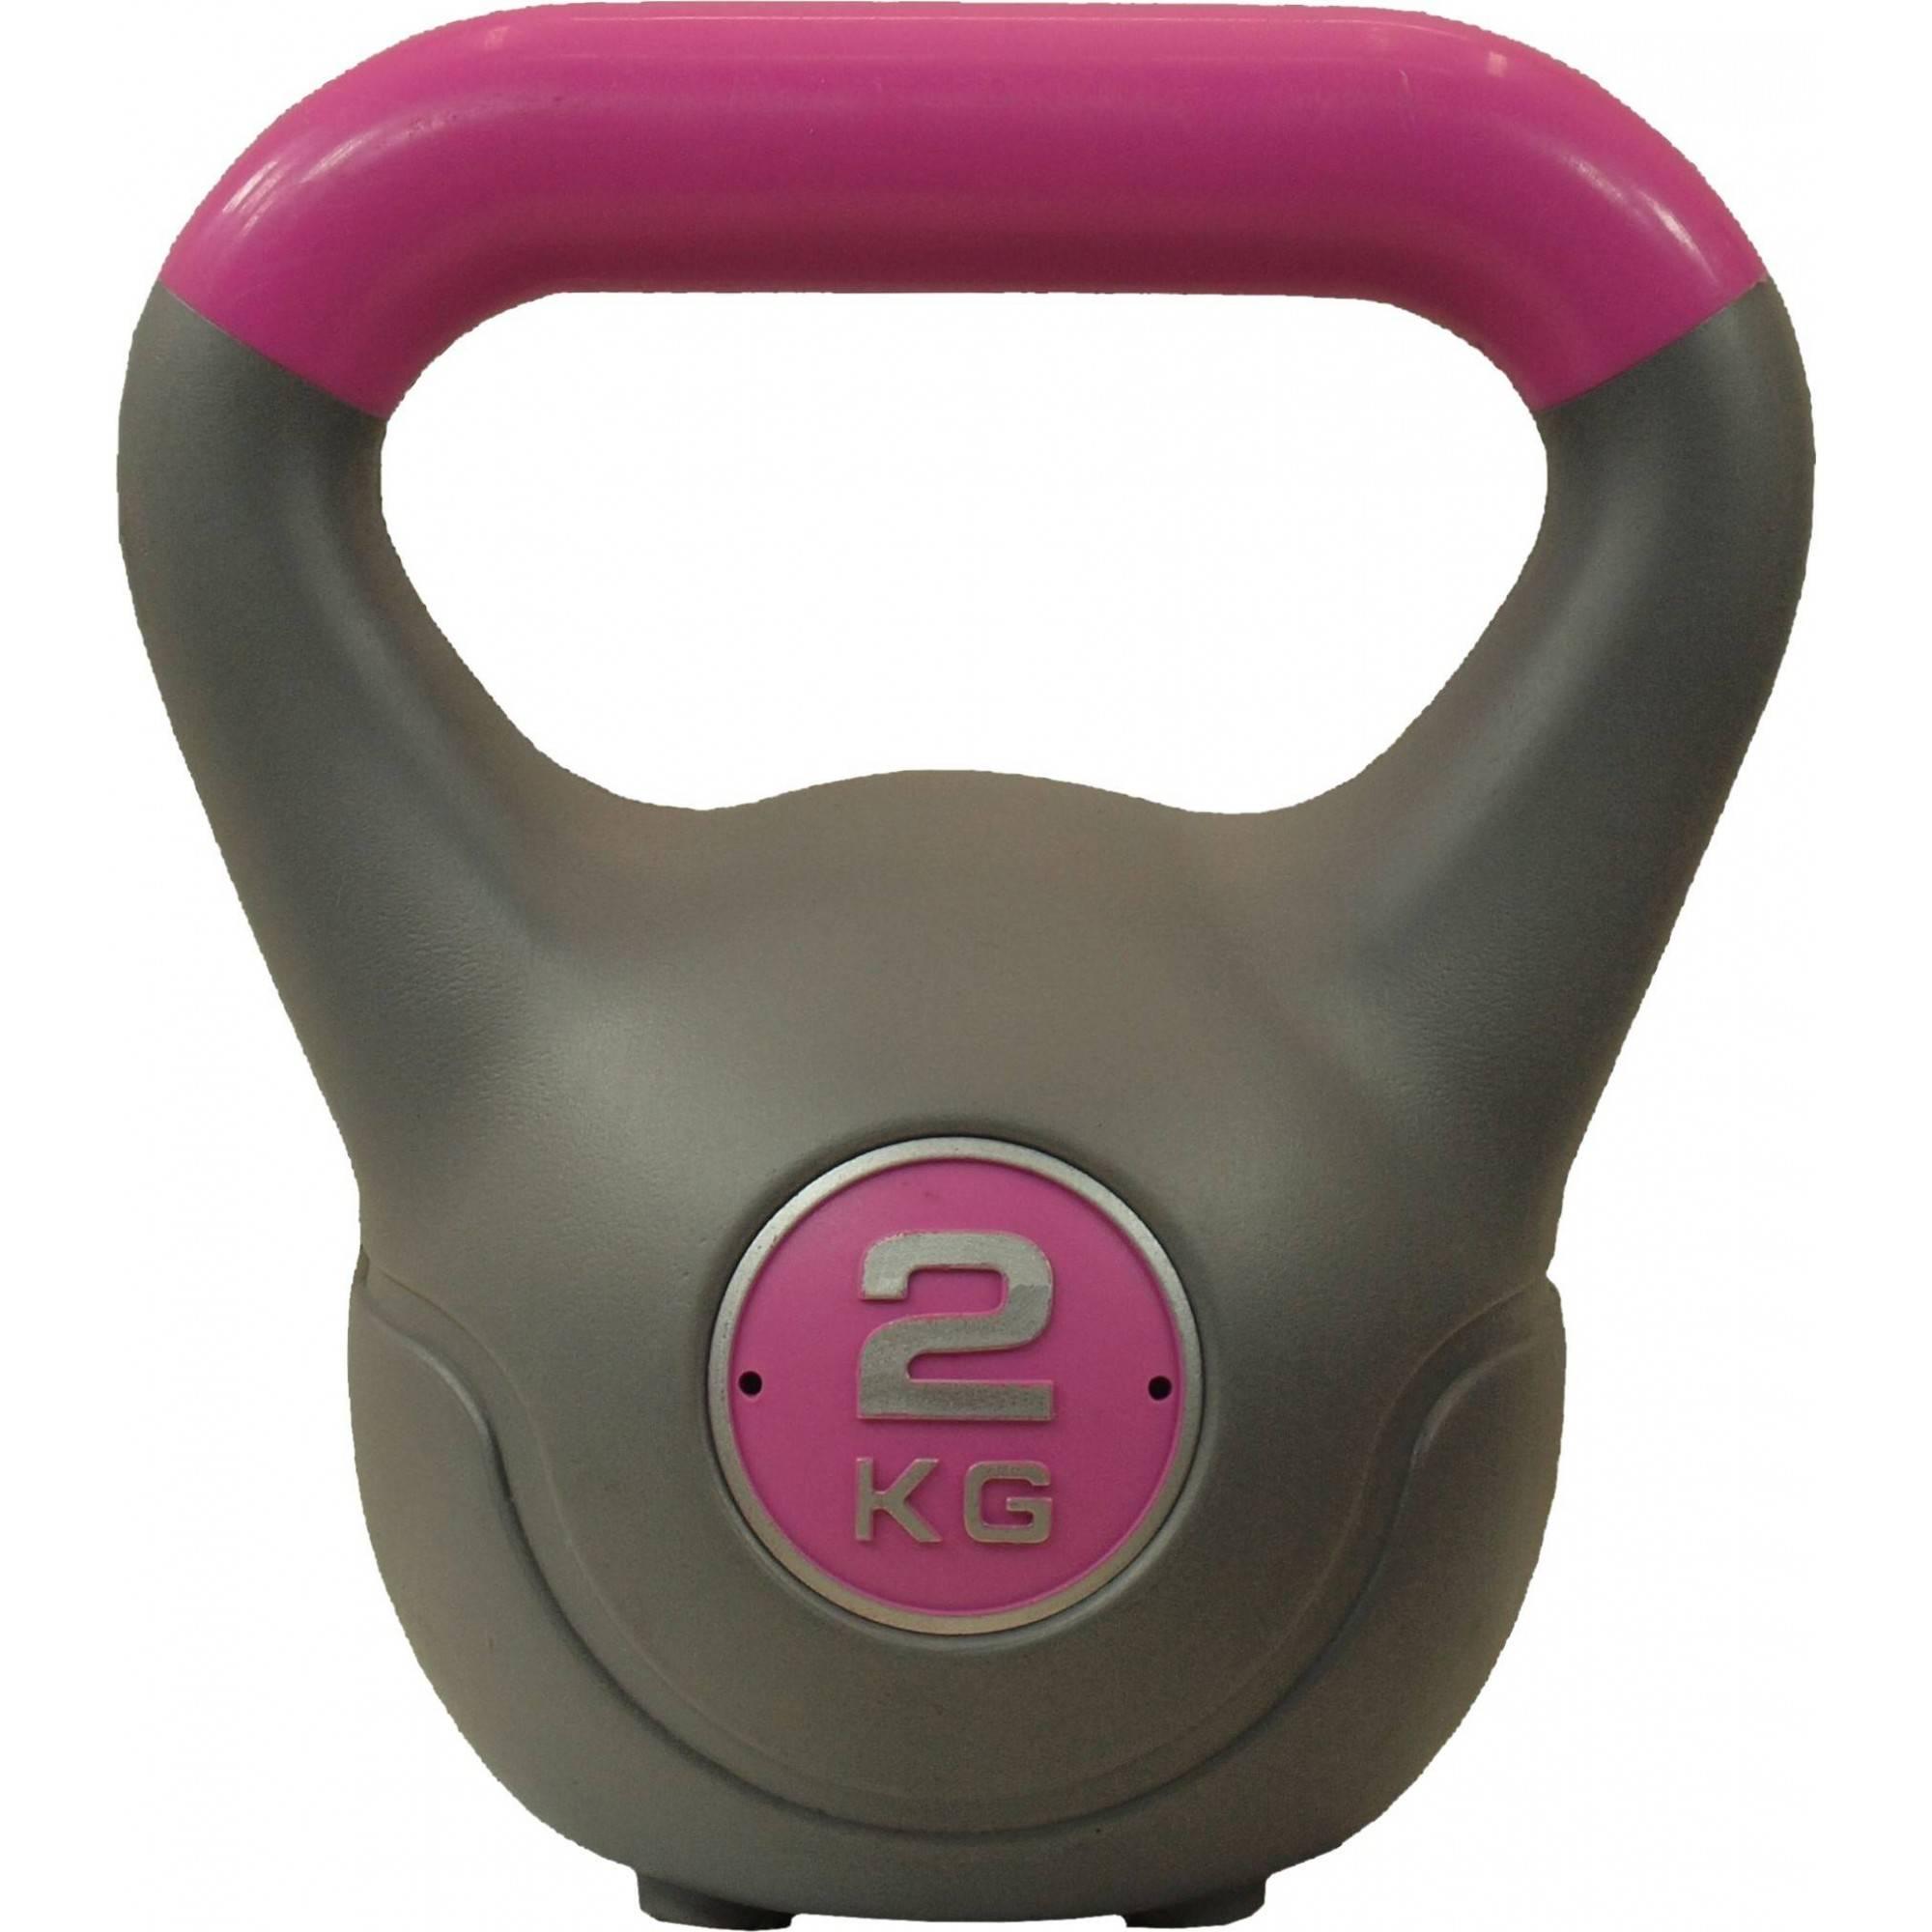 Hantla winylowa kettlebell STAYER SPORT VIN-KET 2kg różowa,producent: Stayer Sport, zdjecie photo: 1 | online shop klubfitness.p